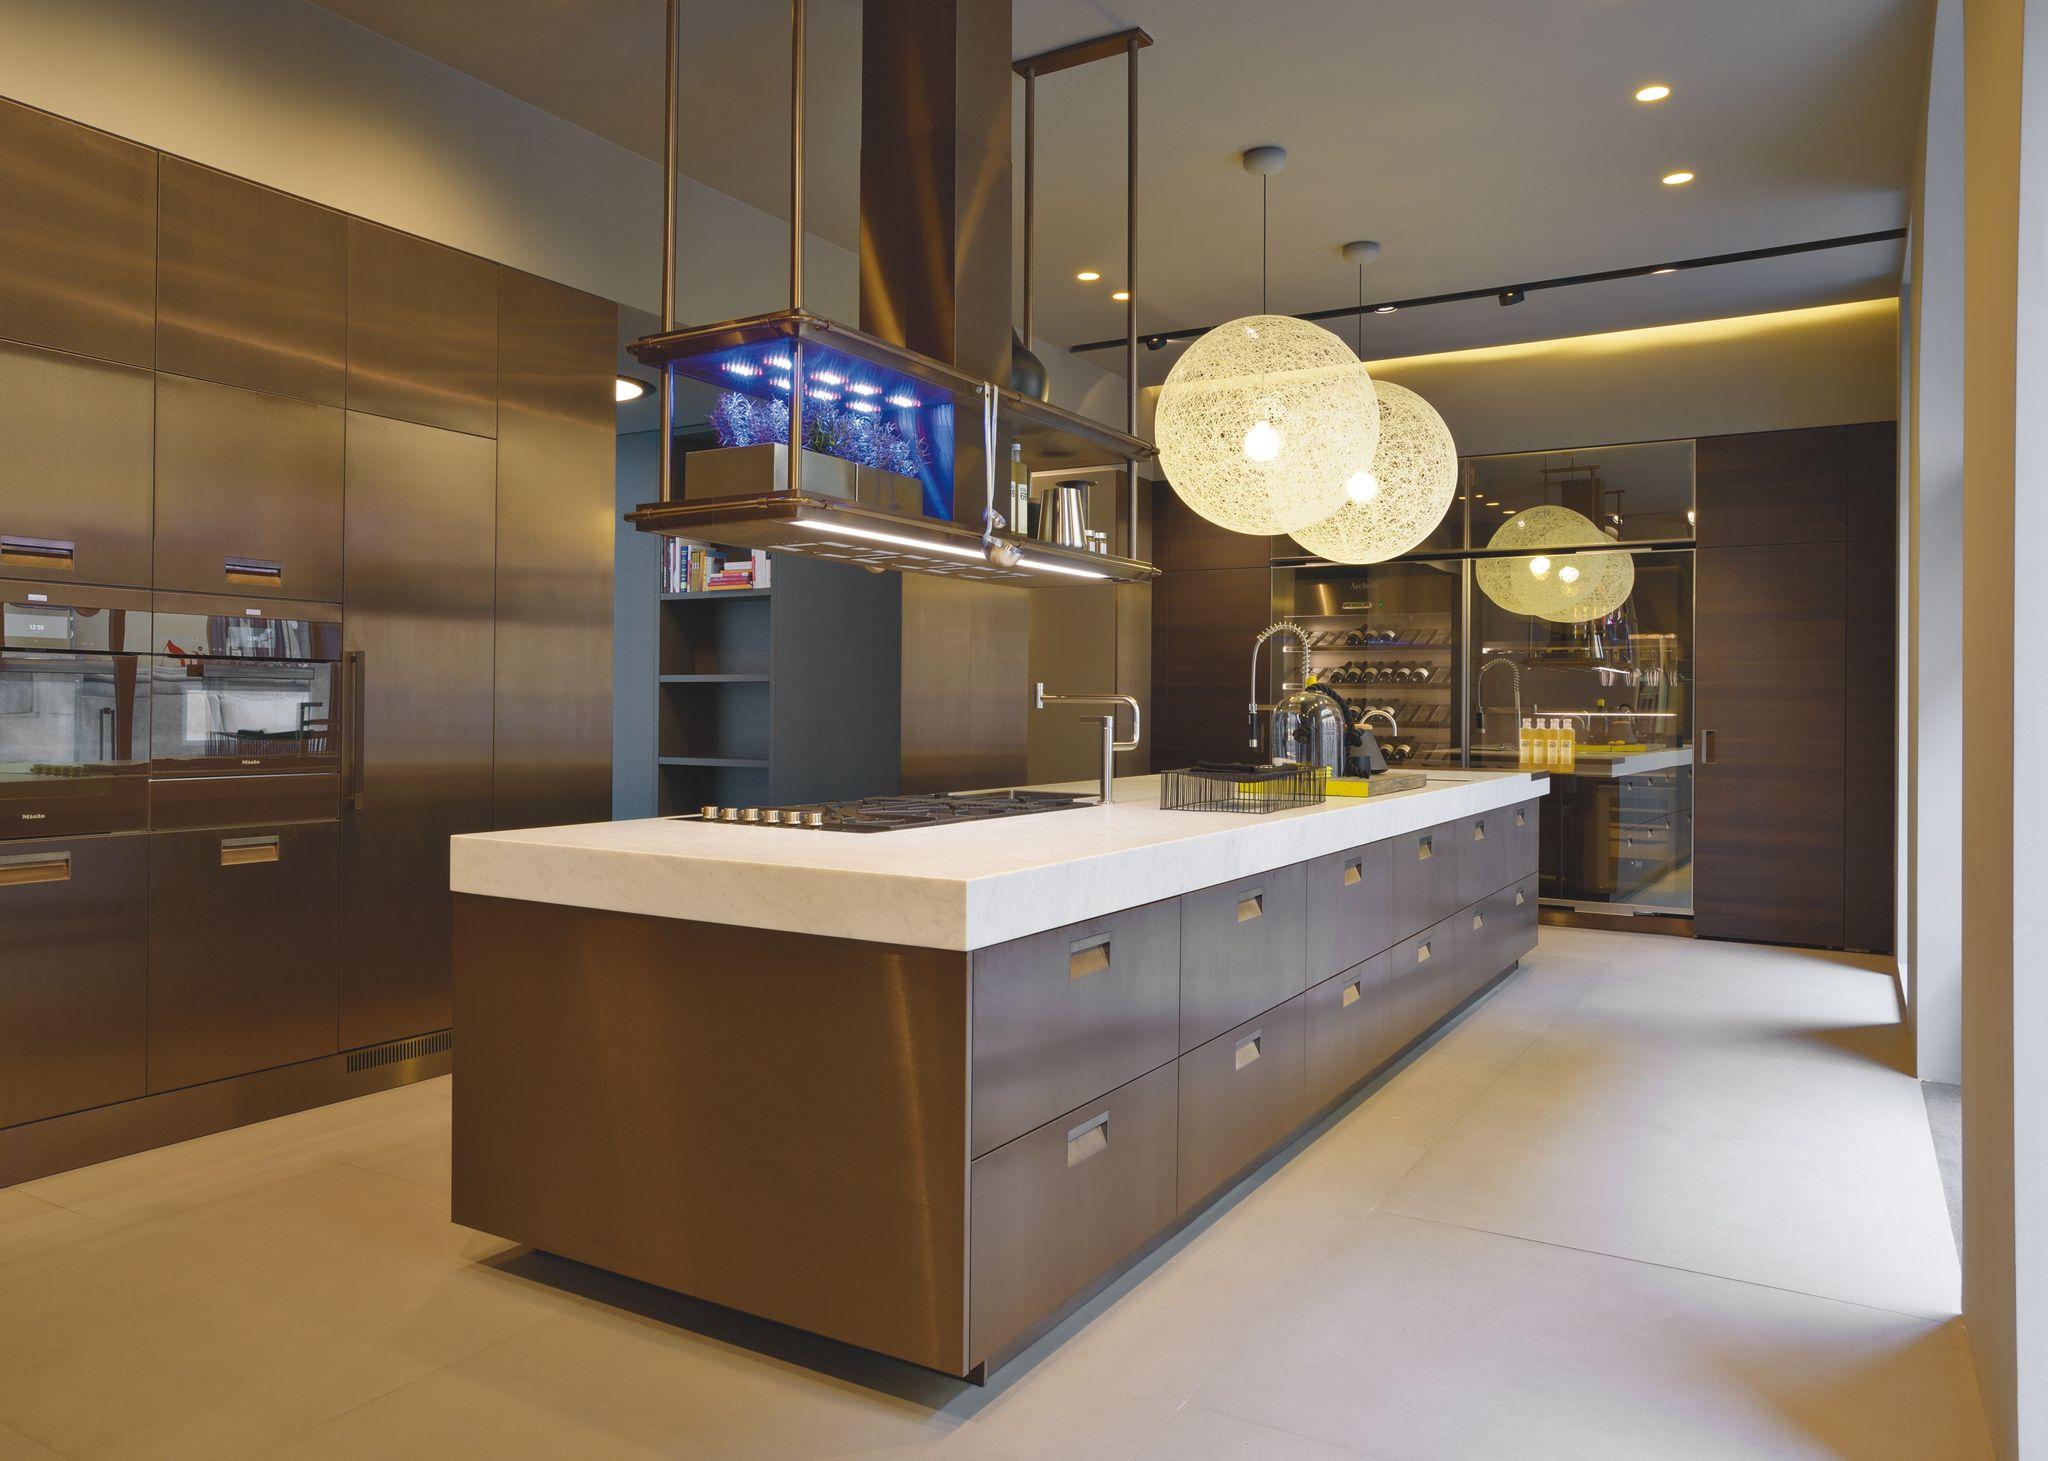 Arclinea modello italia idee case canuto cucine moderne for Mobili cucina italiana